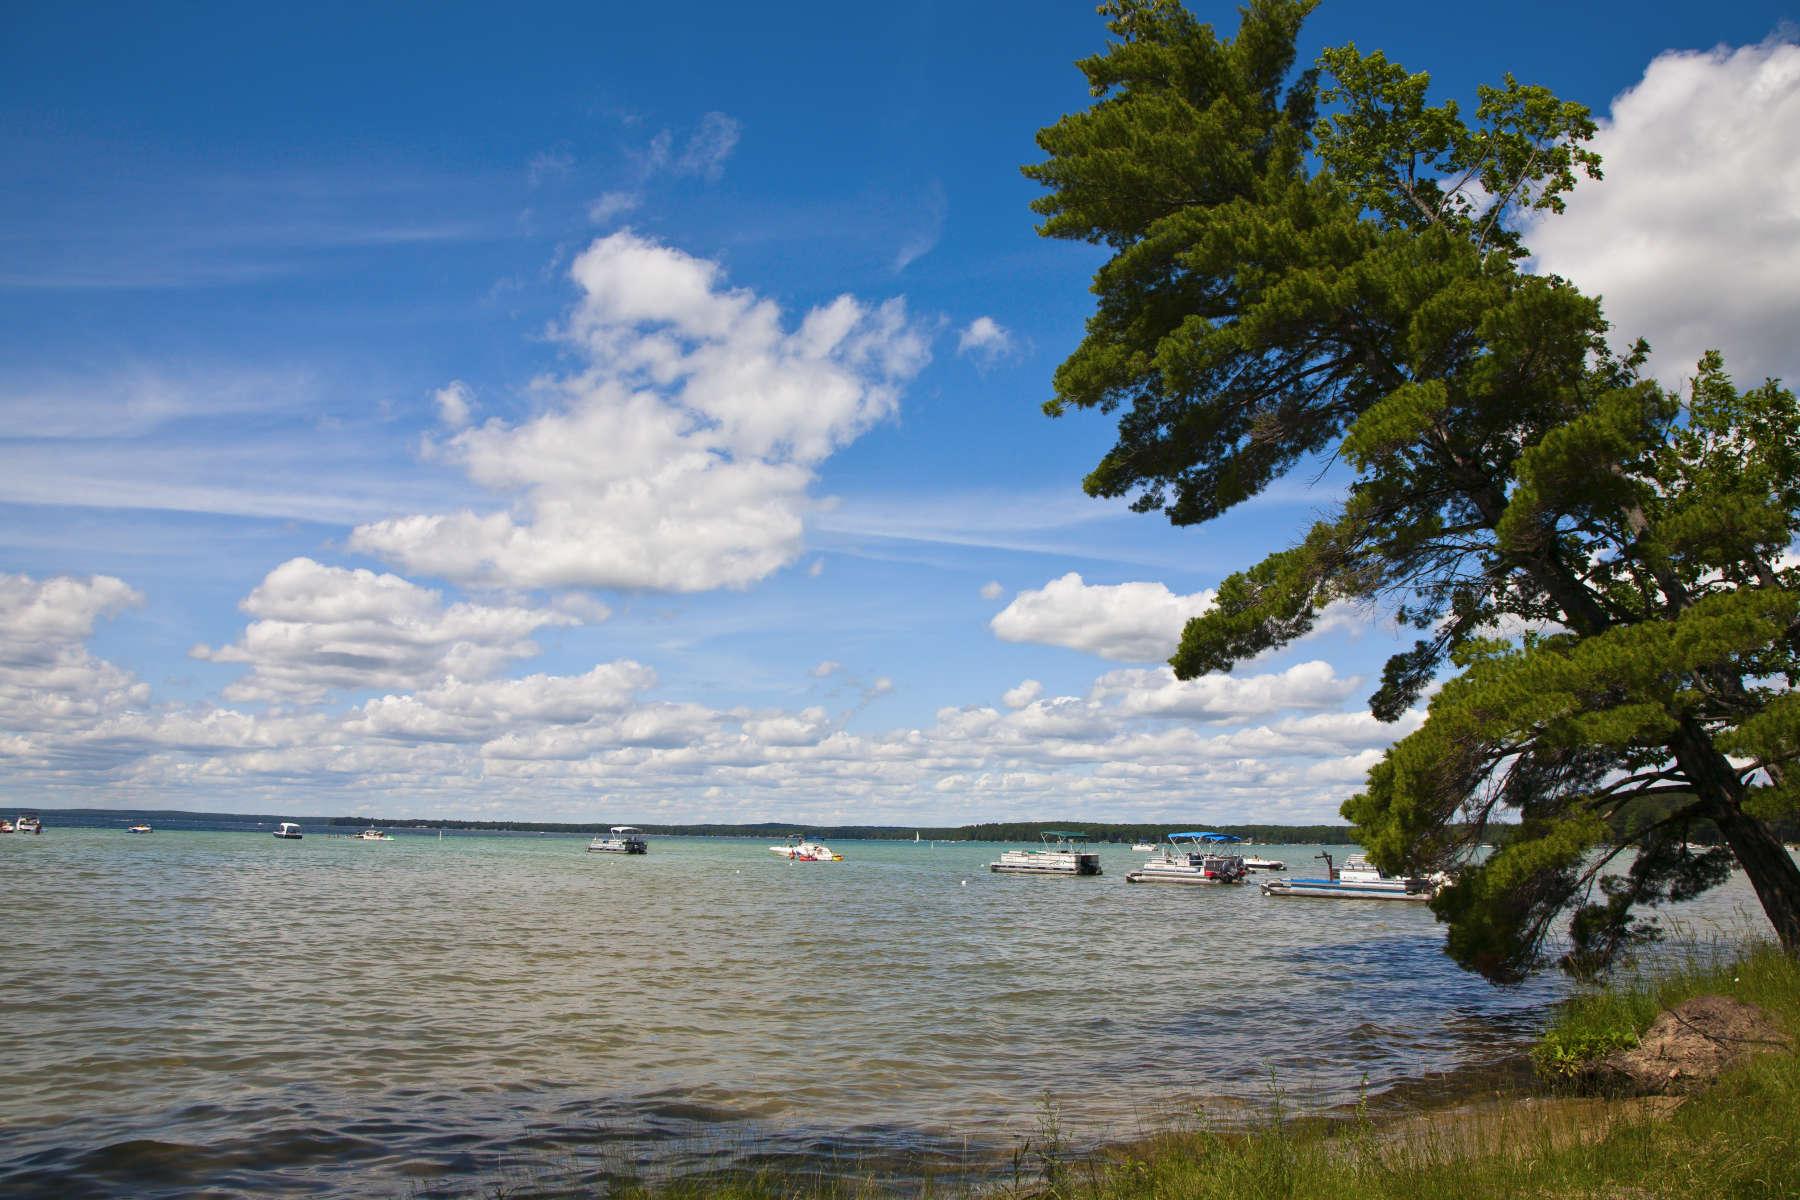 higgins lake men Higgins lake tourism: tripadvisor has 196 reviews of higgins lake hotels, attractions, and restaurants making it your best higgins lake resource.